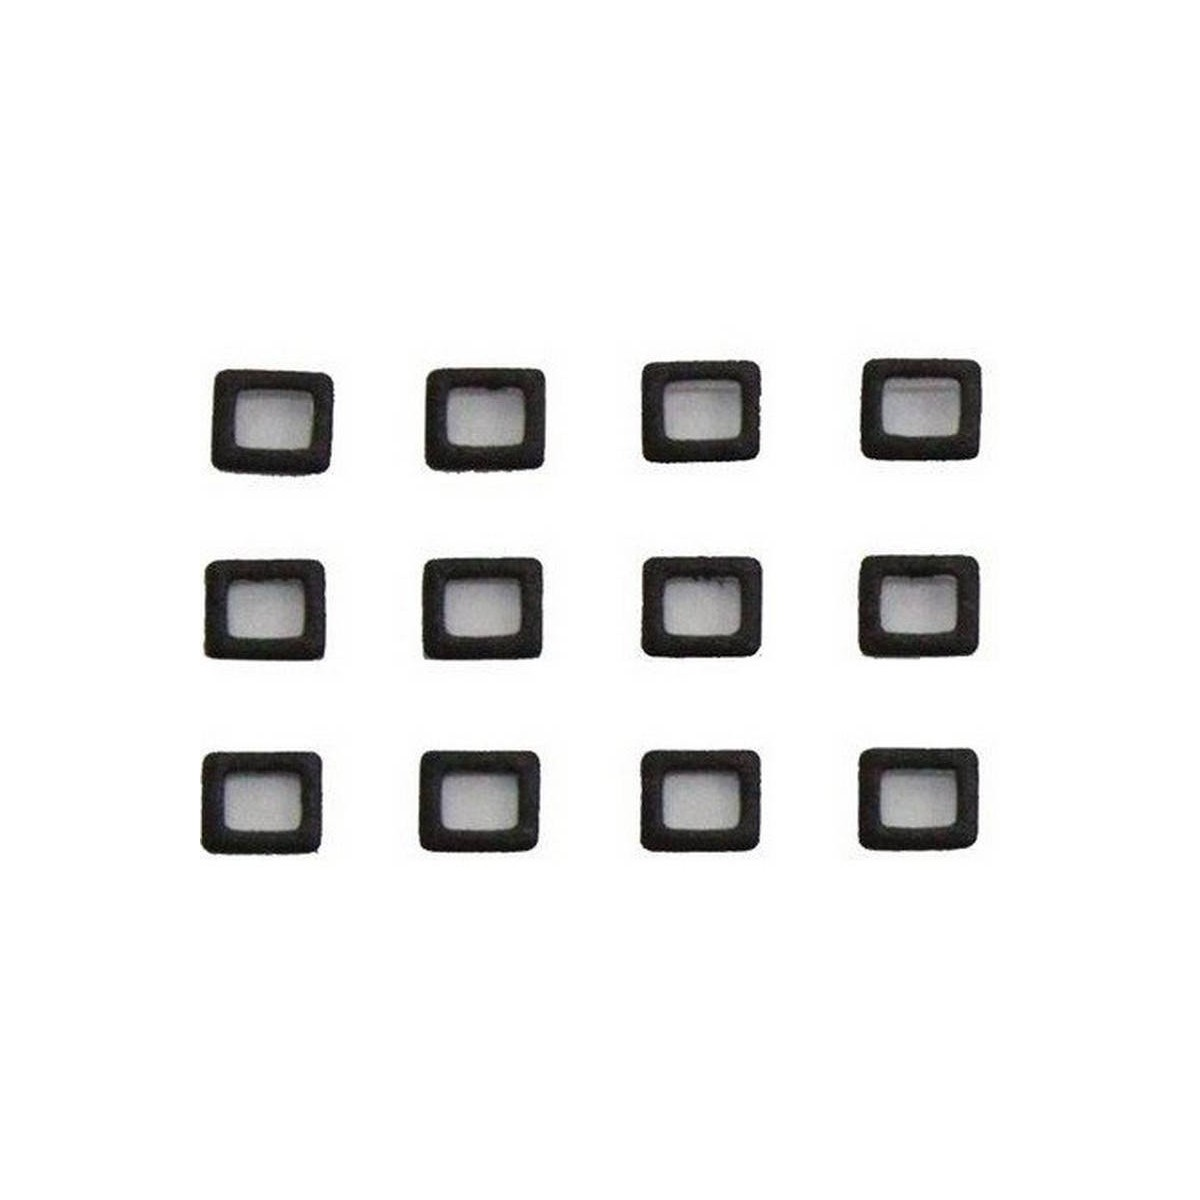 Filtro para el Sensor de Proximidad iPhone 4/4S